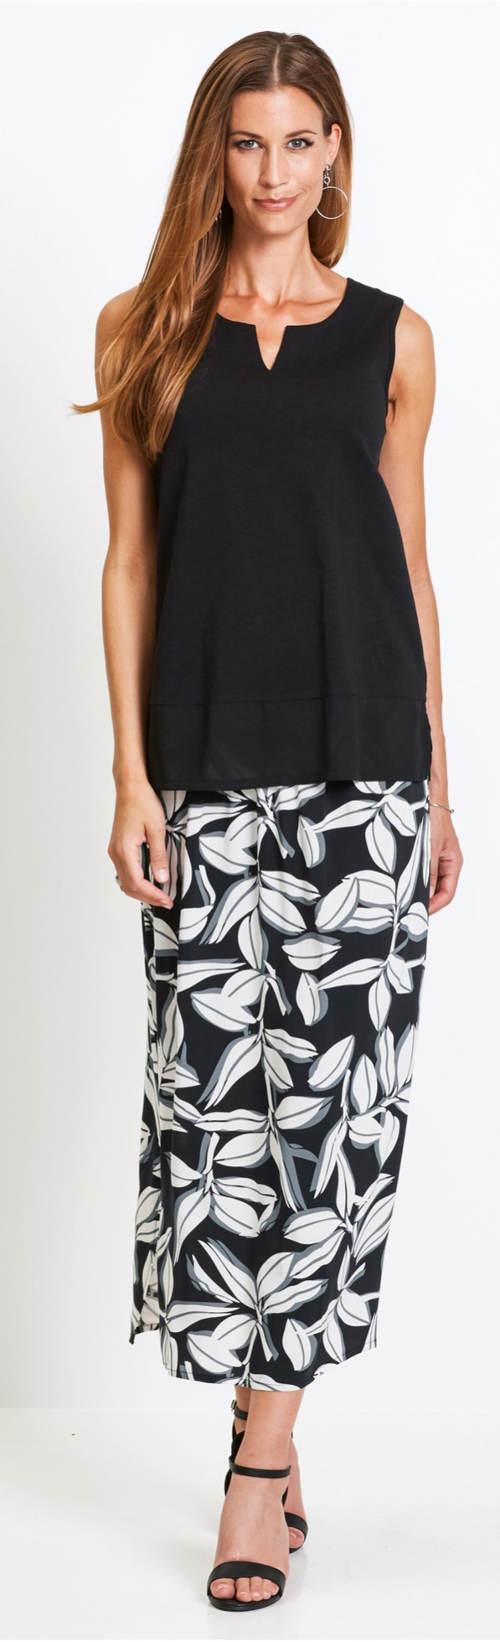 Čierne letné tielko s maxi sukňou